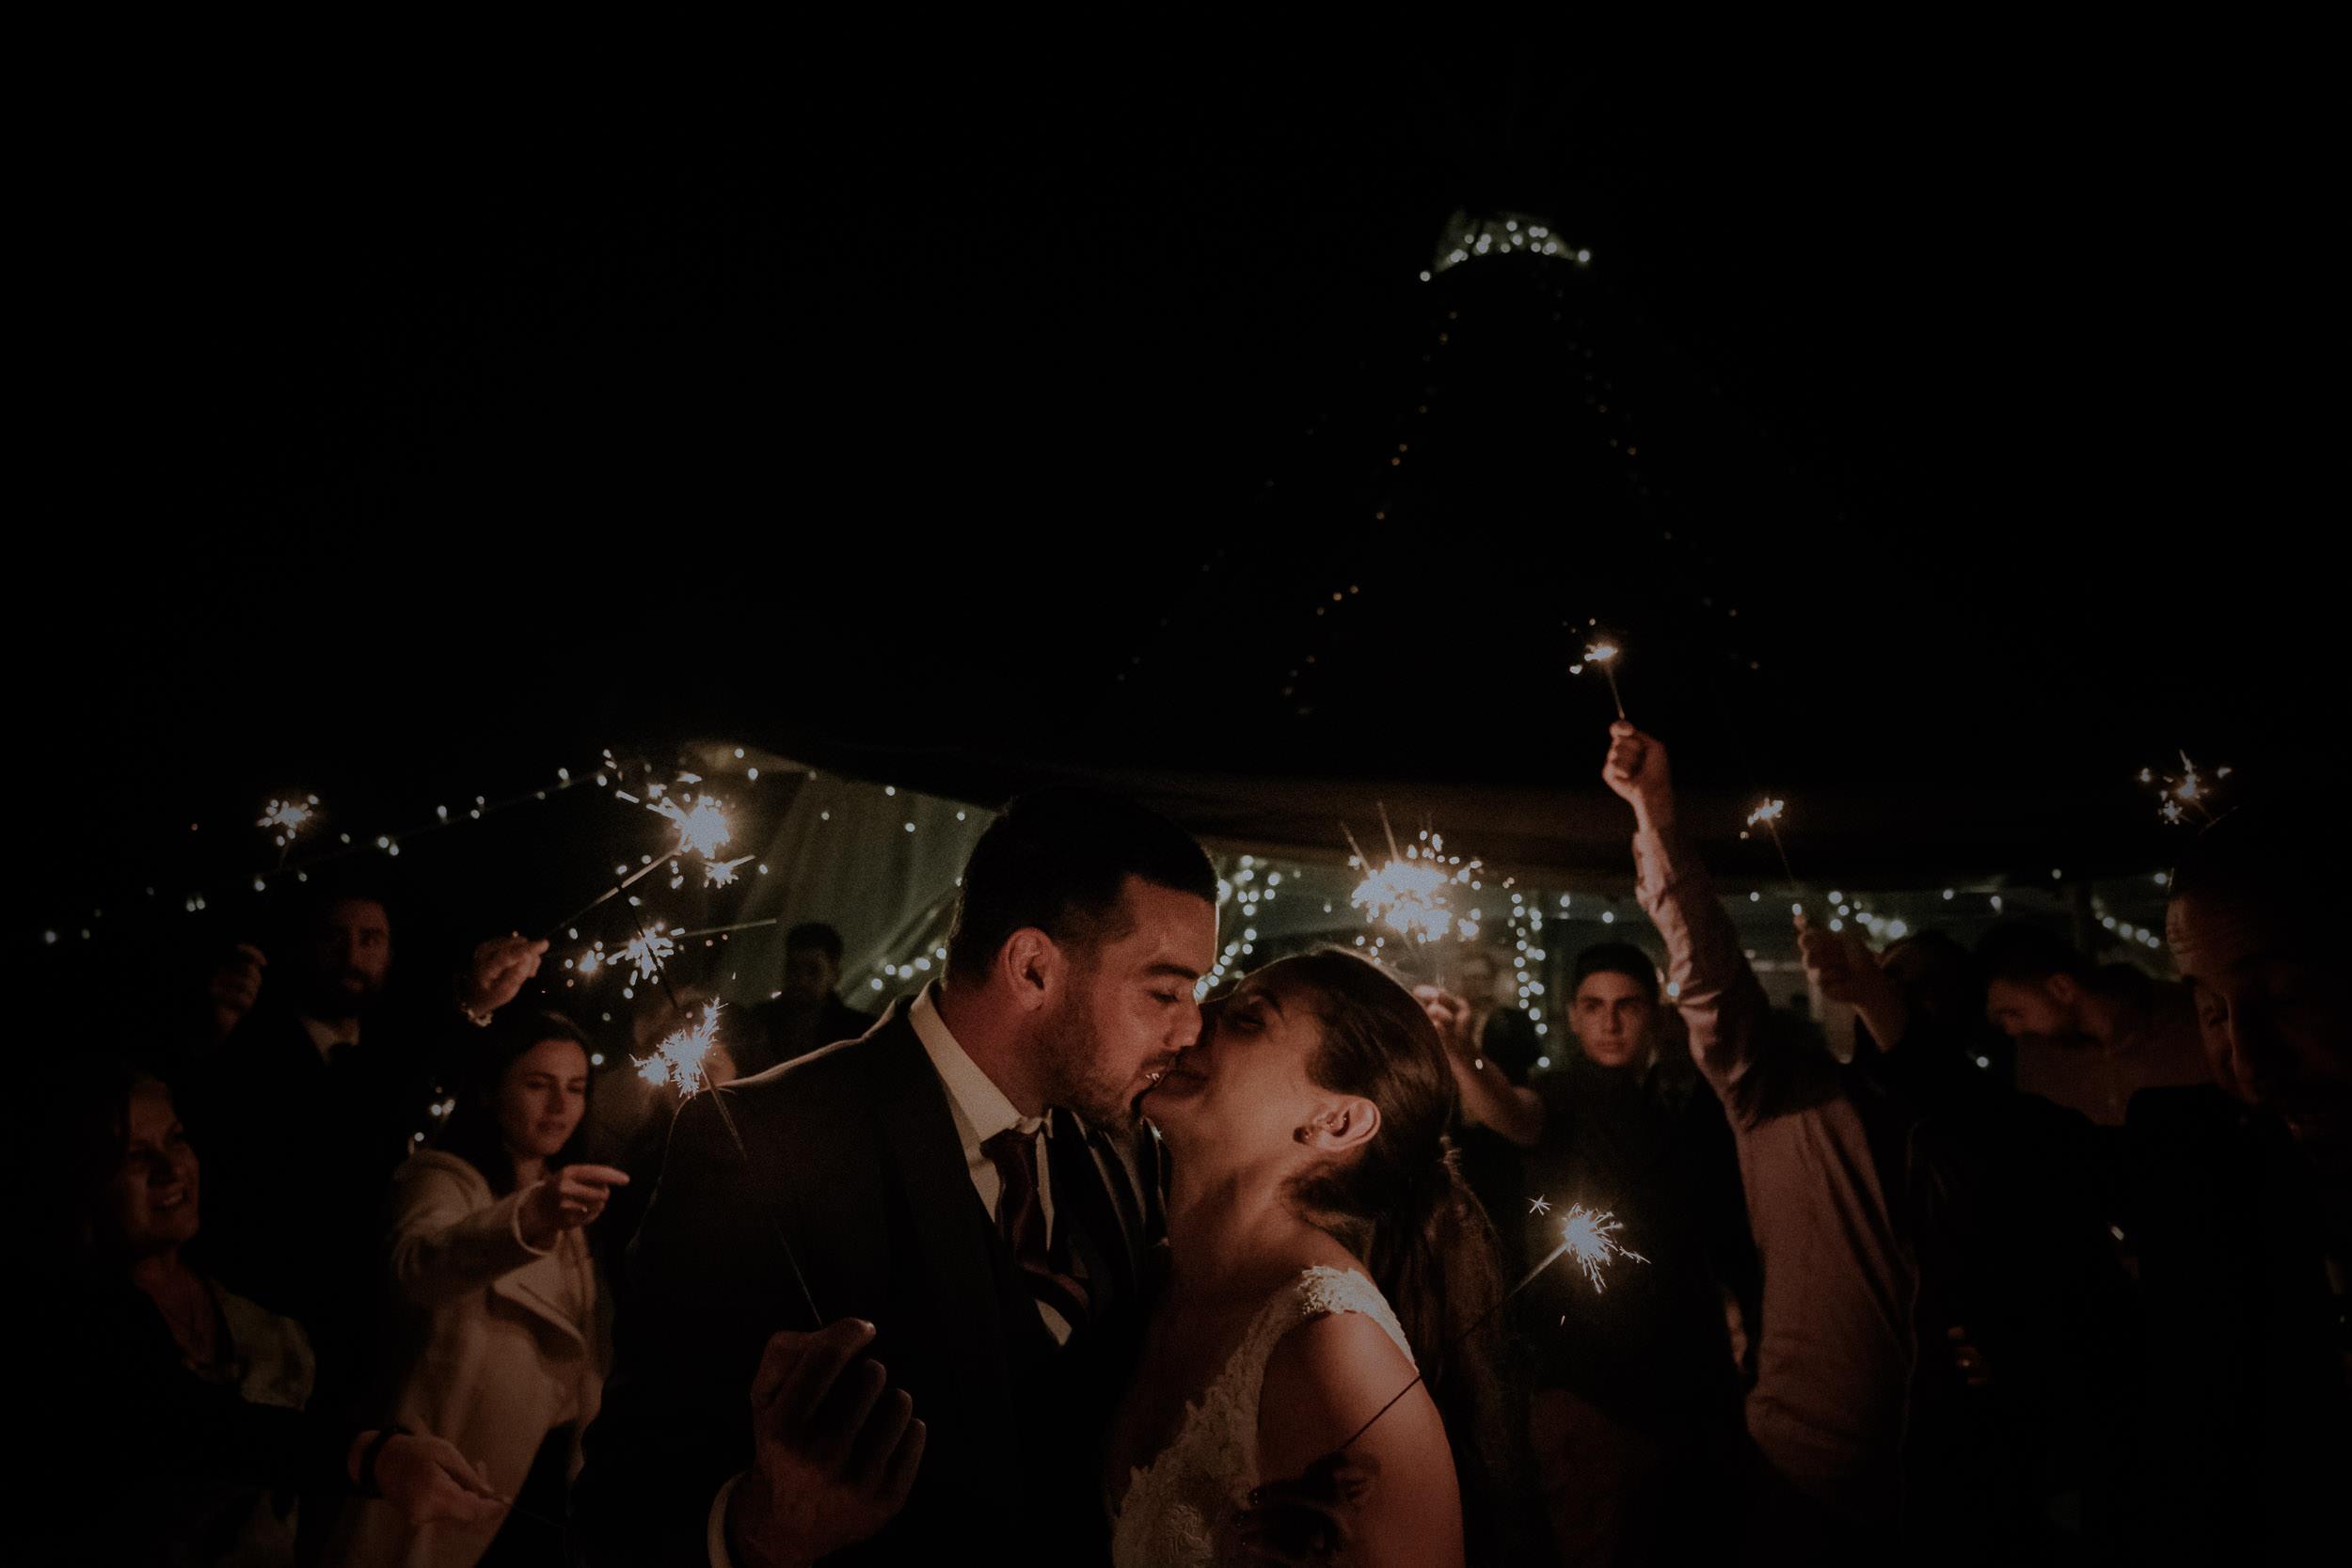 g_c wedding - kings _ thieves elopement wedding photography - blog 155.jpg